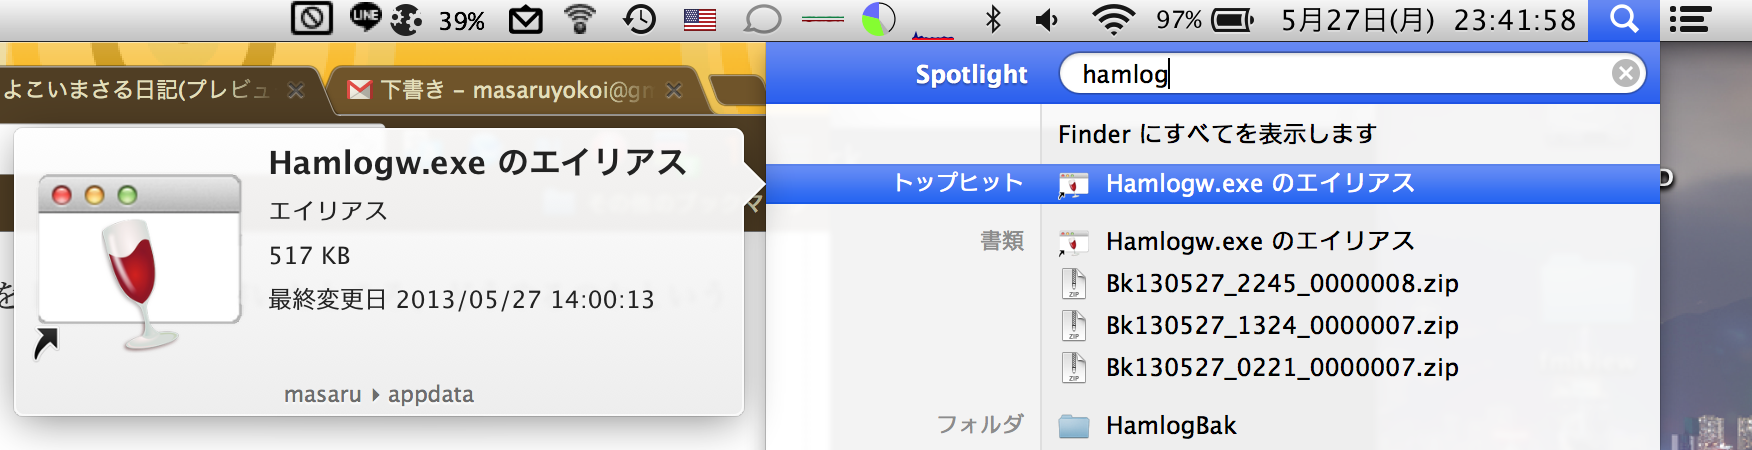 Spotlight で検索